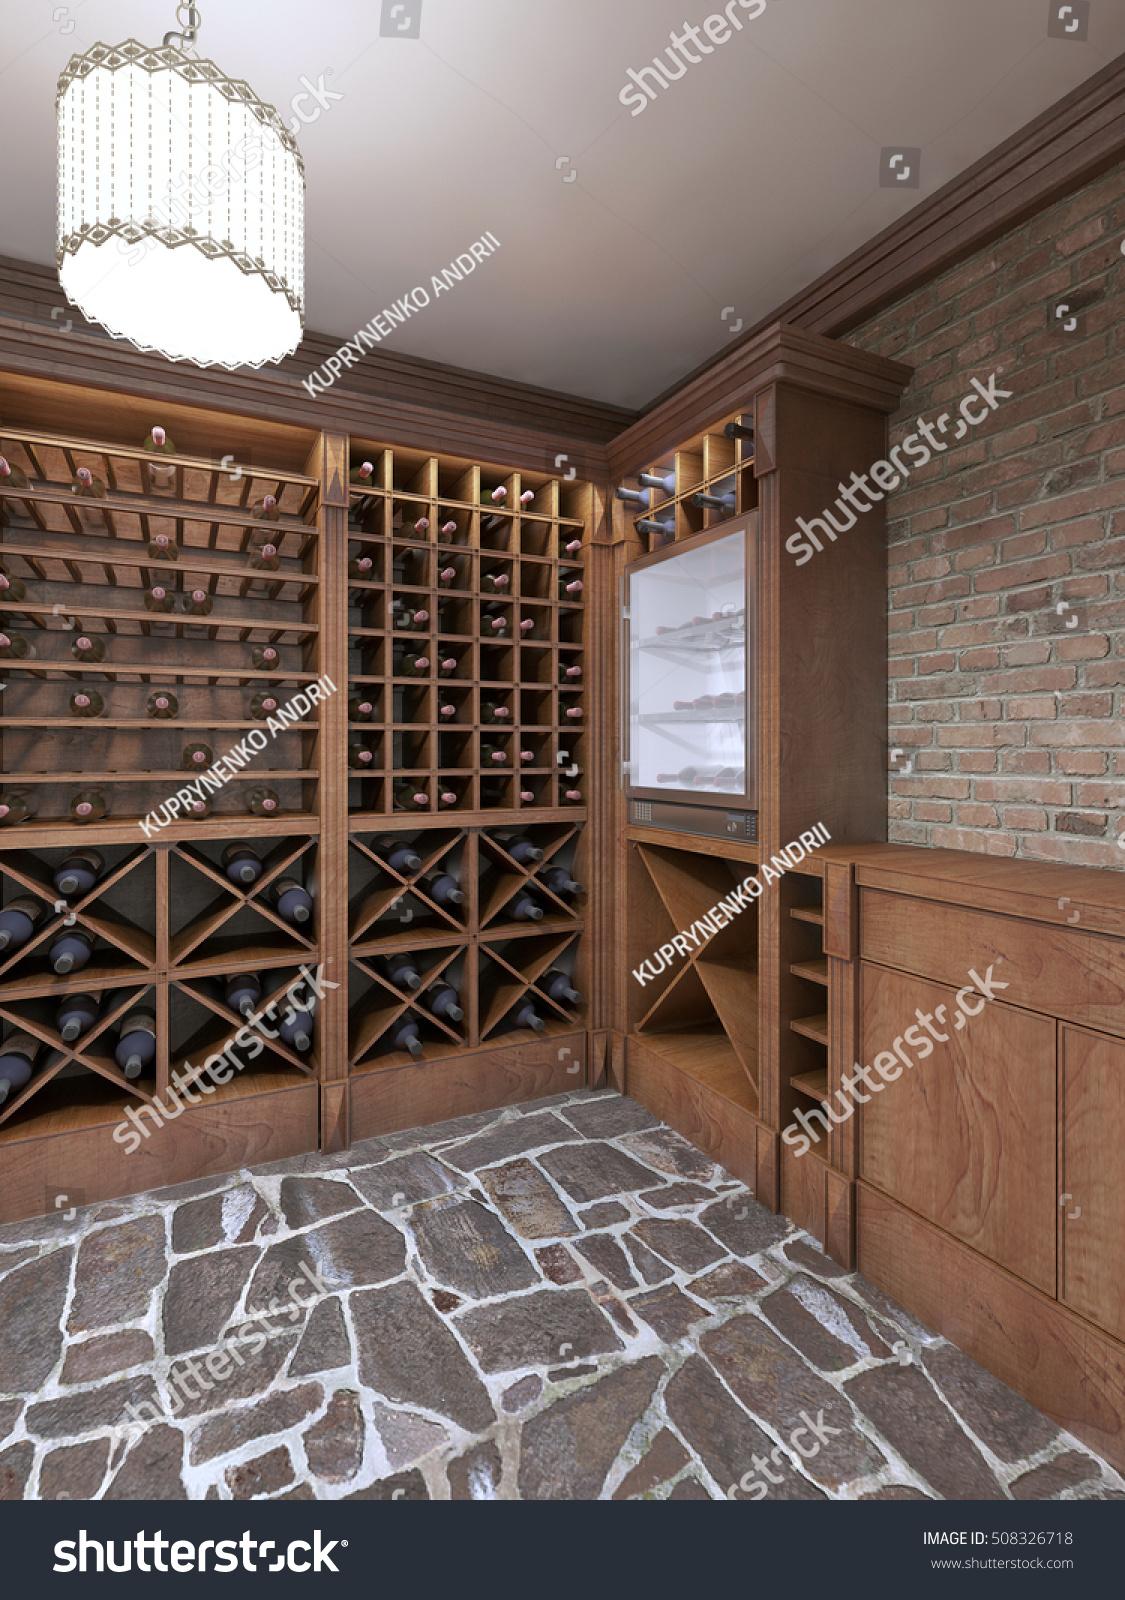 Wine Cellar Basement House Rustic Style Stock Illustration 508326718